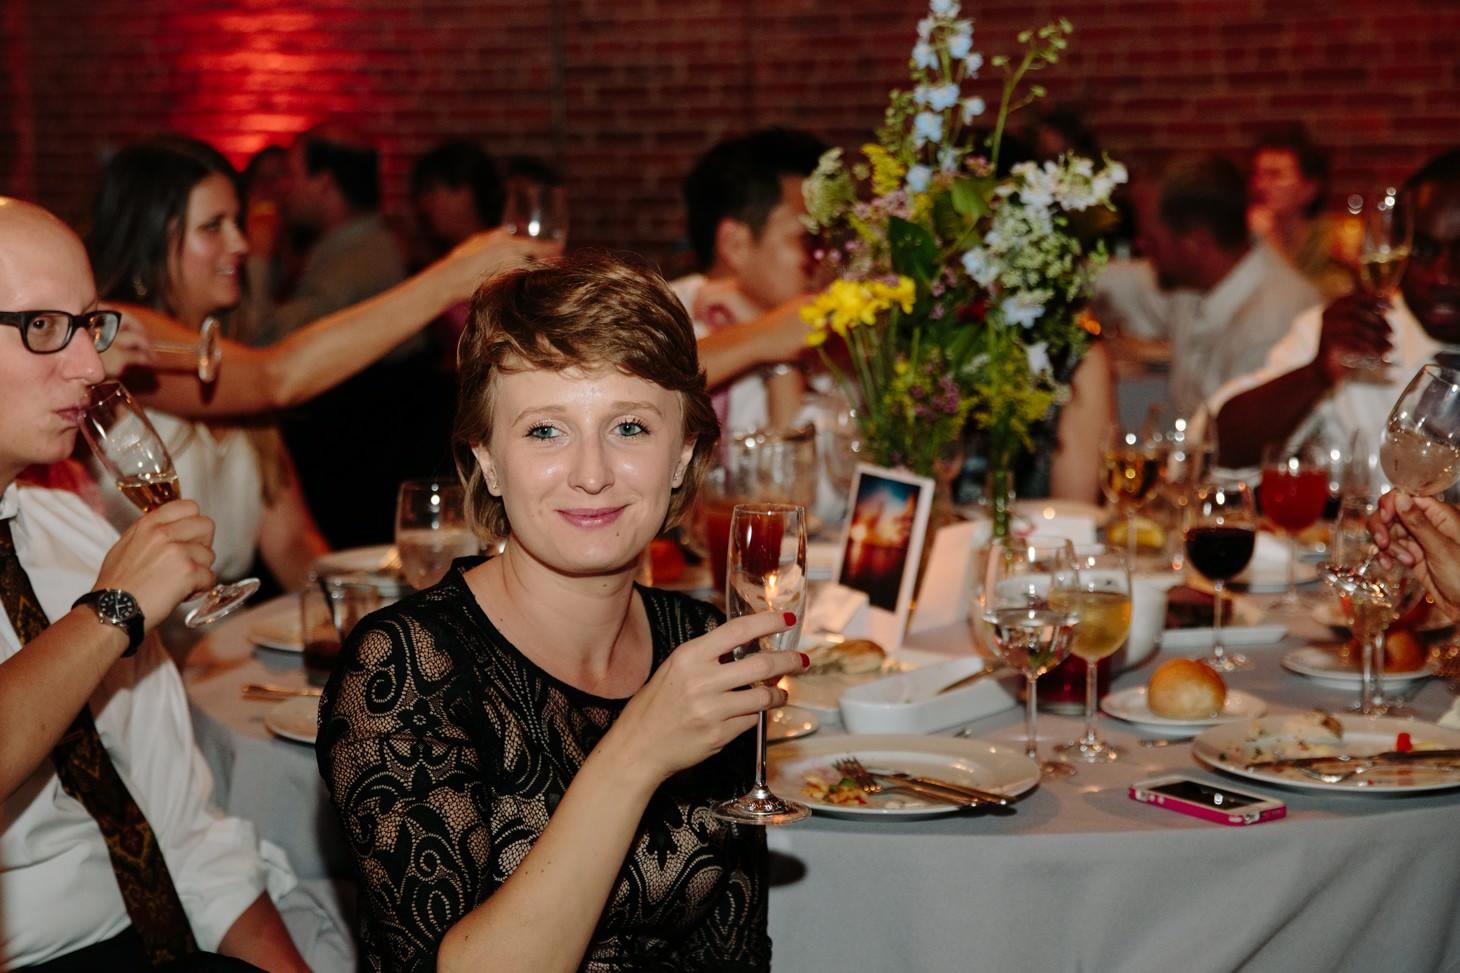 042-nyc-dumbo-loft-brooklyn-wedding-photographer-smitten-chickens-photo-.jpg